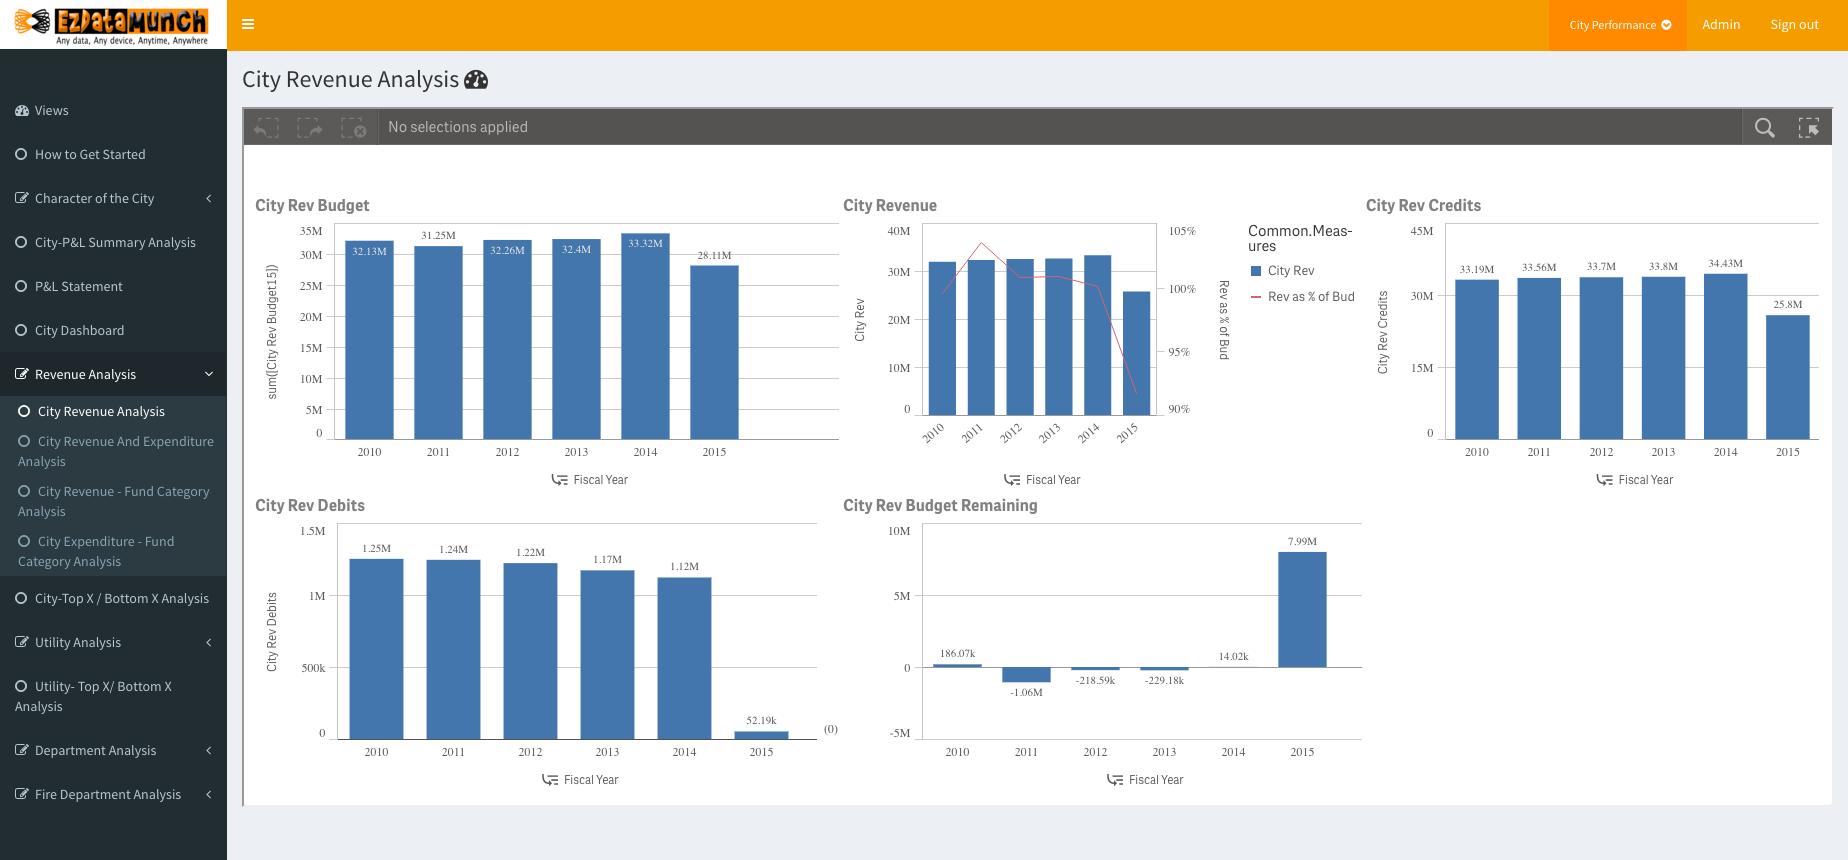 bi governance city revenue analysis